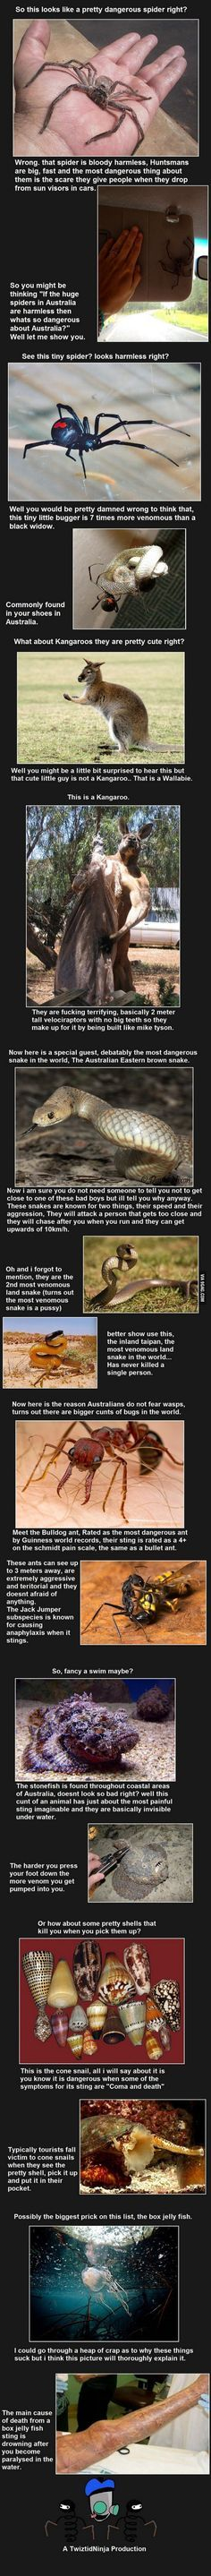 Most dangerous animals in Australia (pt. 1)